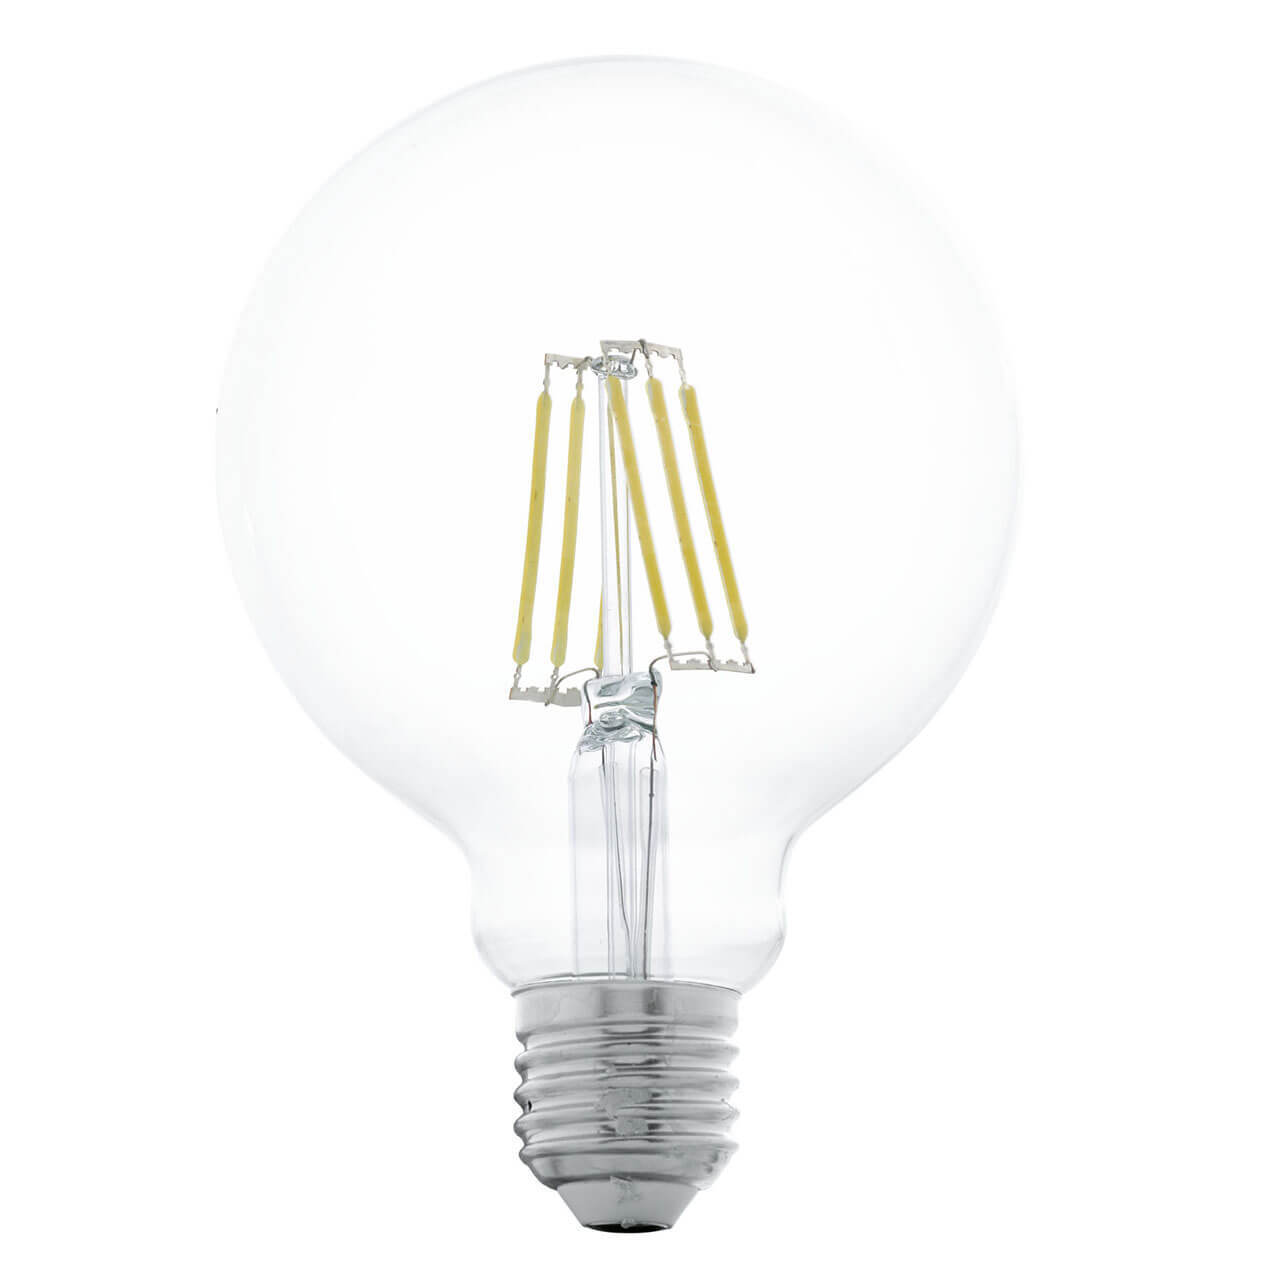 Лампа светодиодная филаментная Eglo E27 6W 2700К прозрачная 11503 цены онлайн